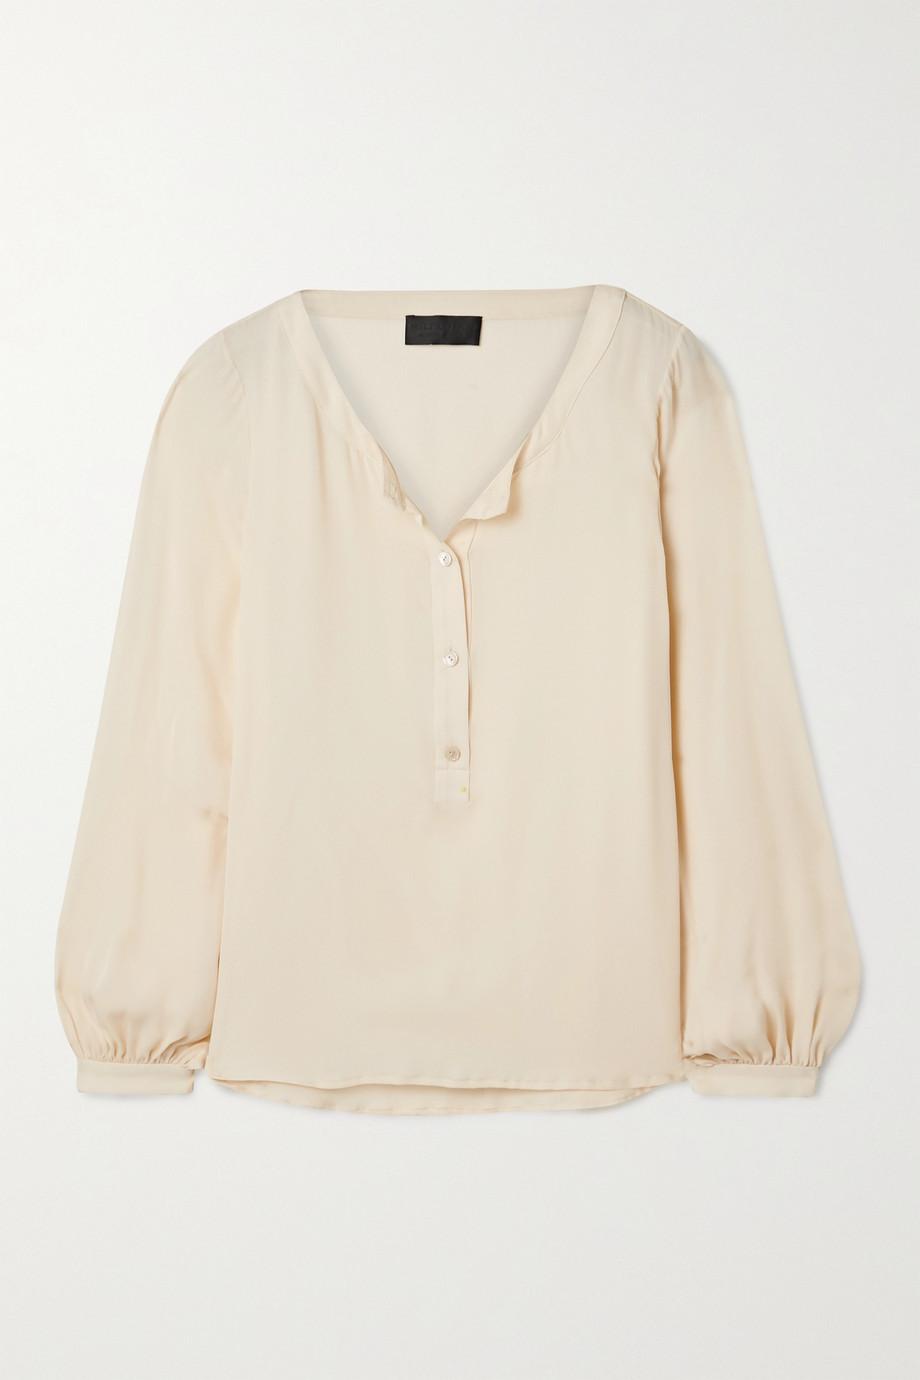 Nili Lotan Kelly silk-georgette blouse